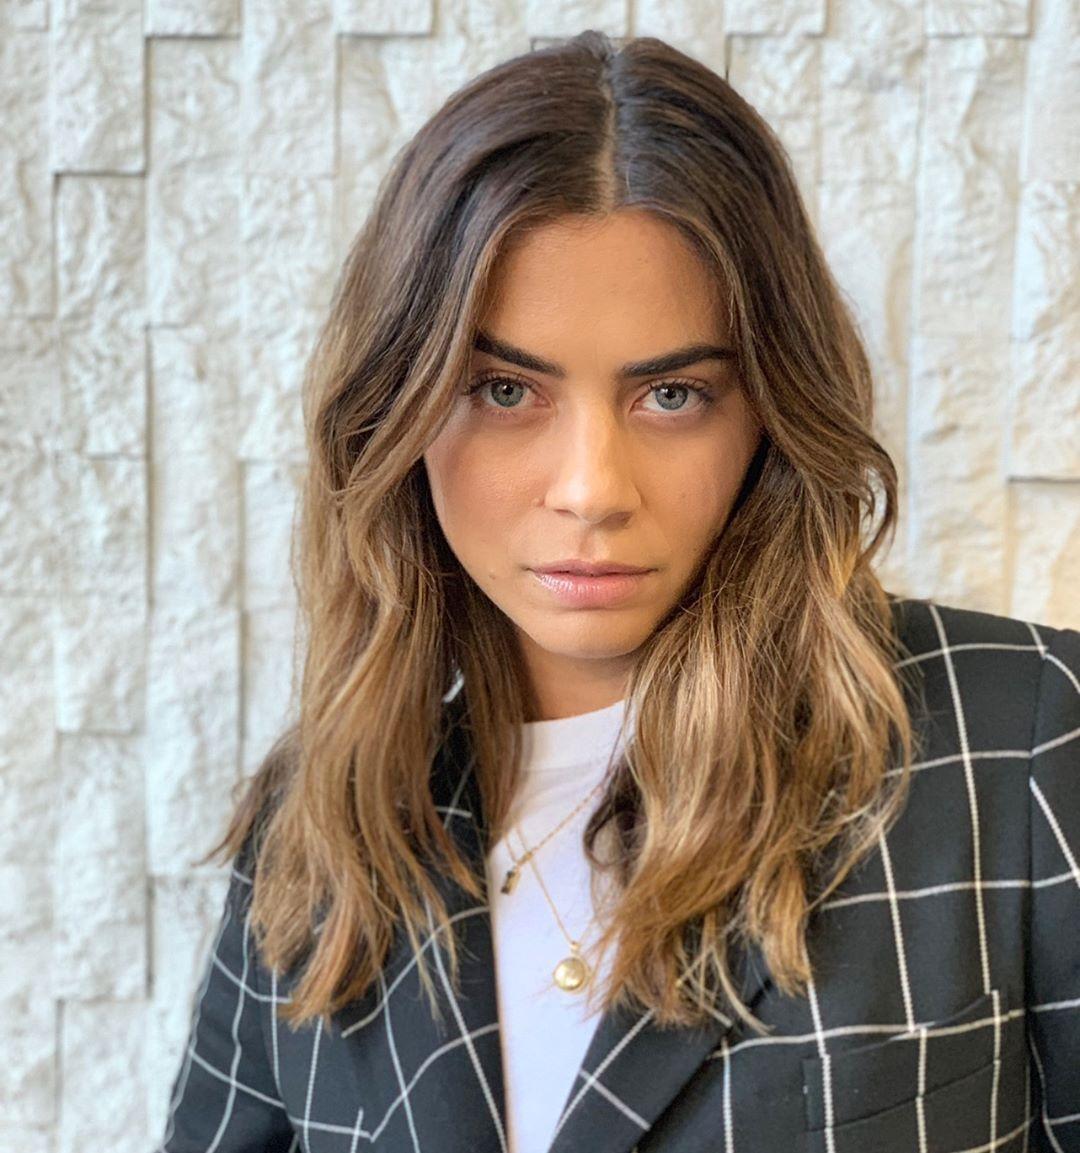 Lorenza Izzo On Instagram Yesterday Werk Styled By Elkin Hair By Bobbyeliot Face By Kmannmakeup Coming Soon In 2019 Hair Hair Styles Long Hair Styles